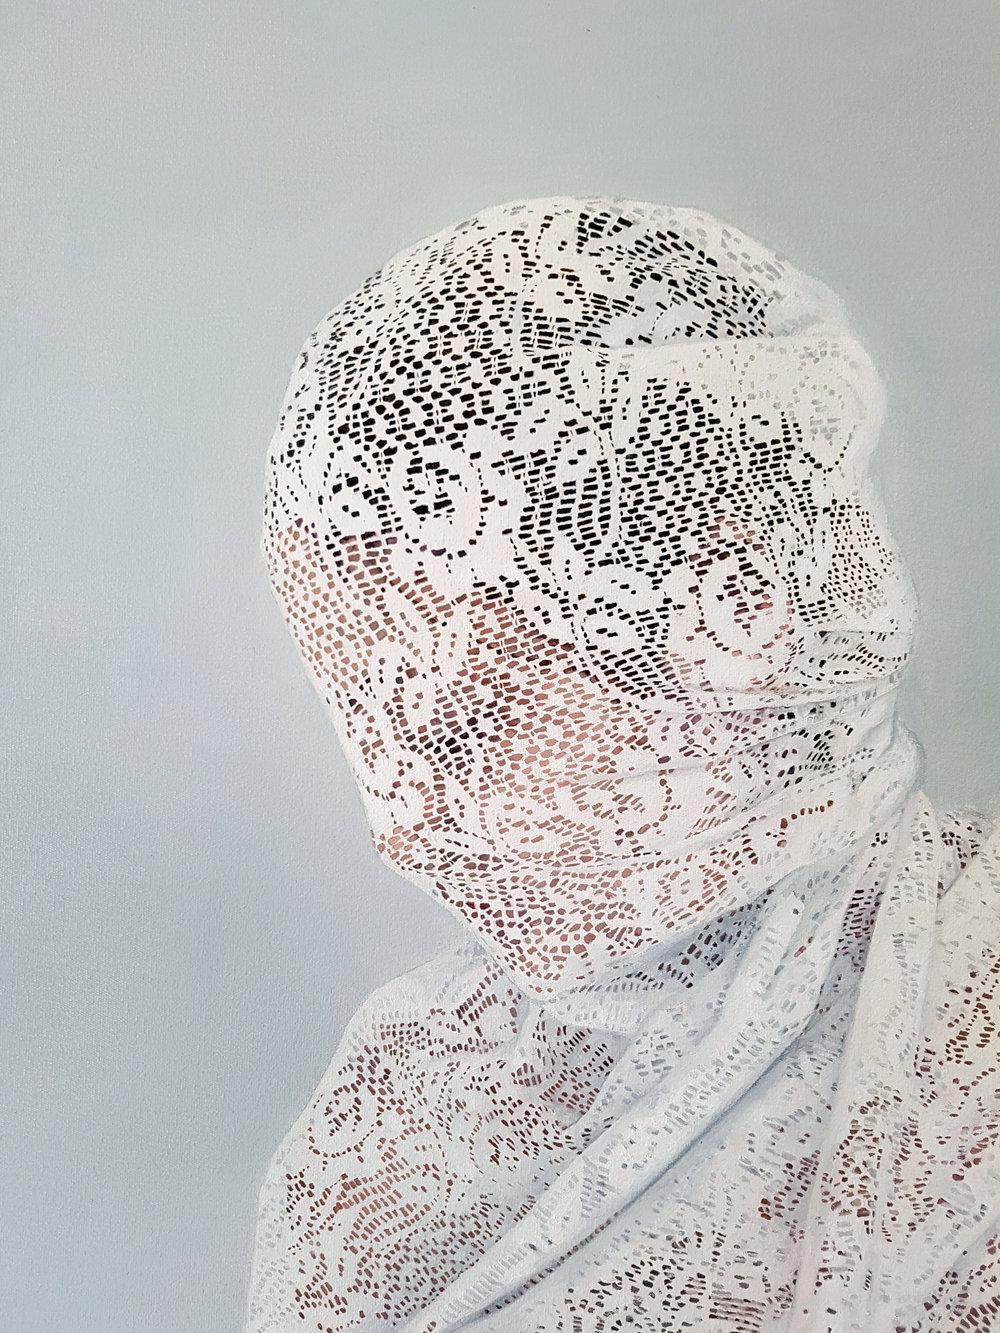 These Violent Delights Have Violent Ends, oil on canvas (detail1), 1300 x 1150mm - Copy.jpg